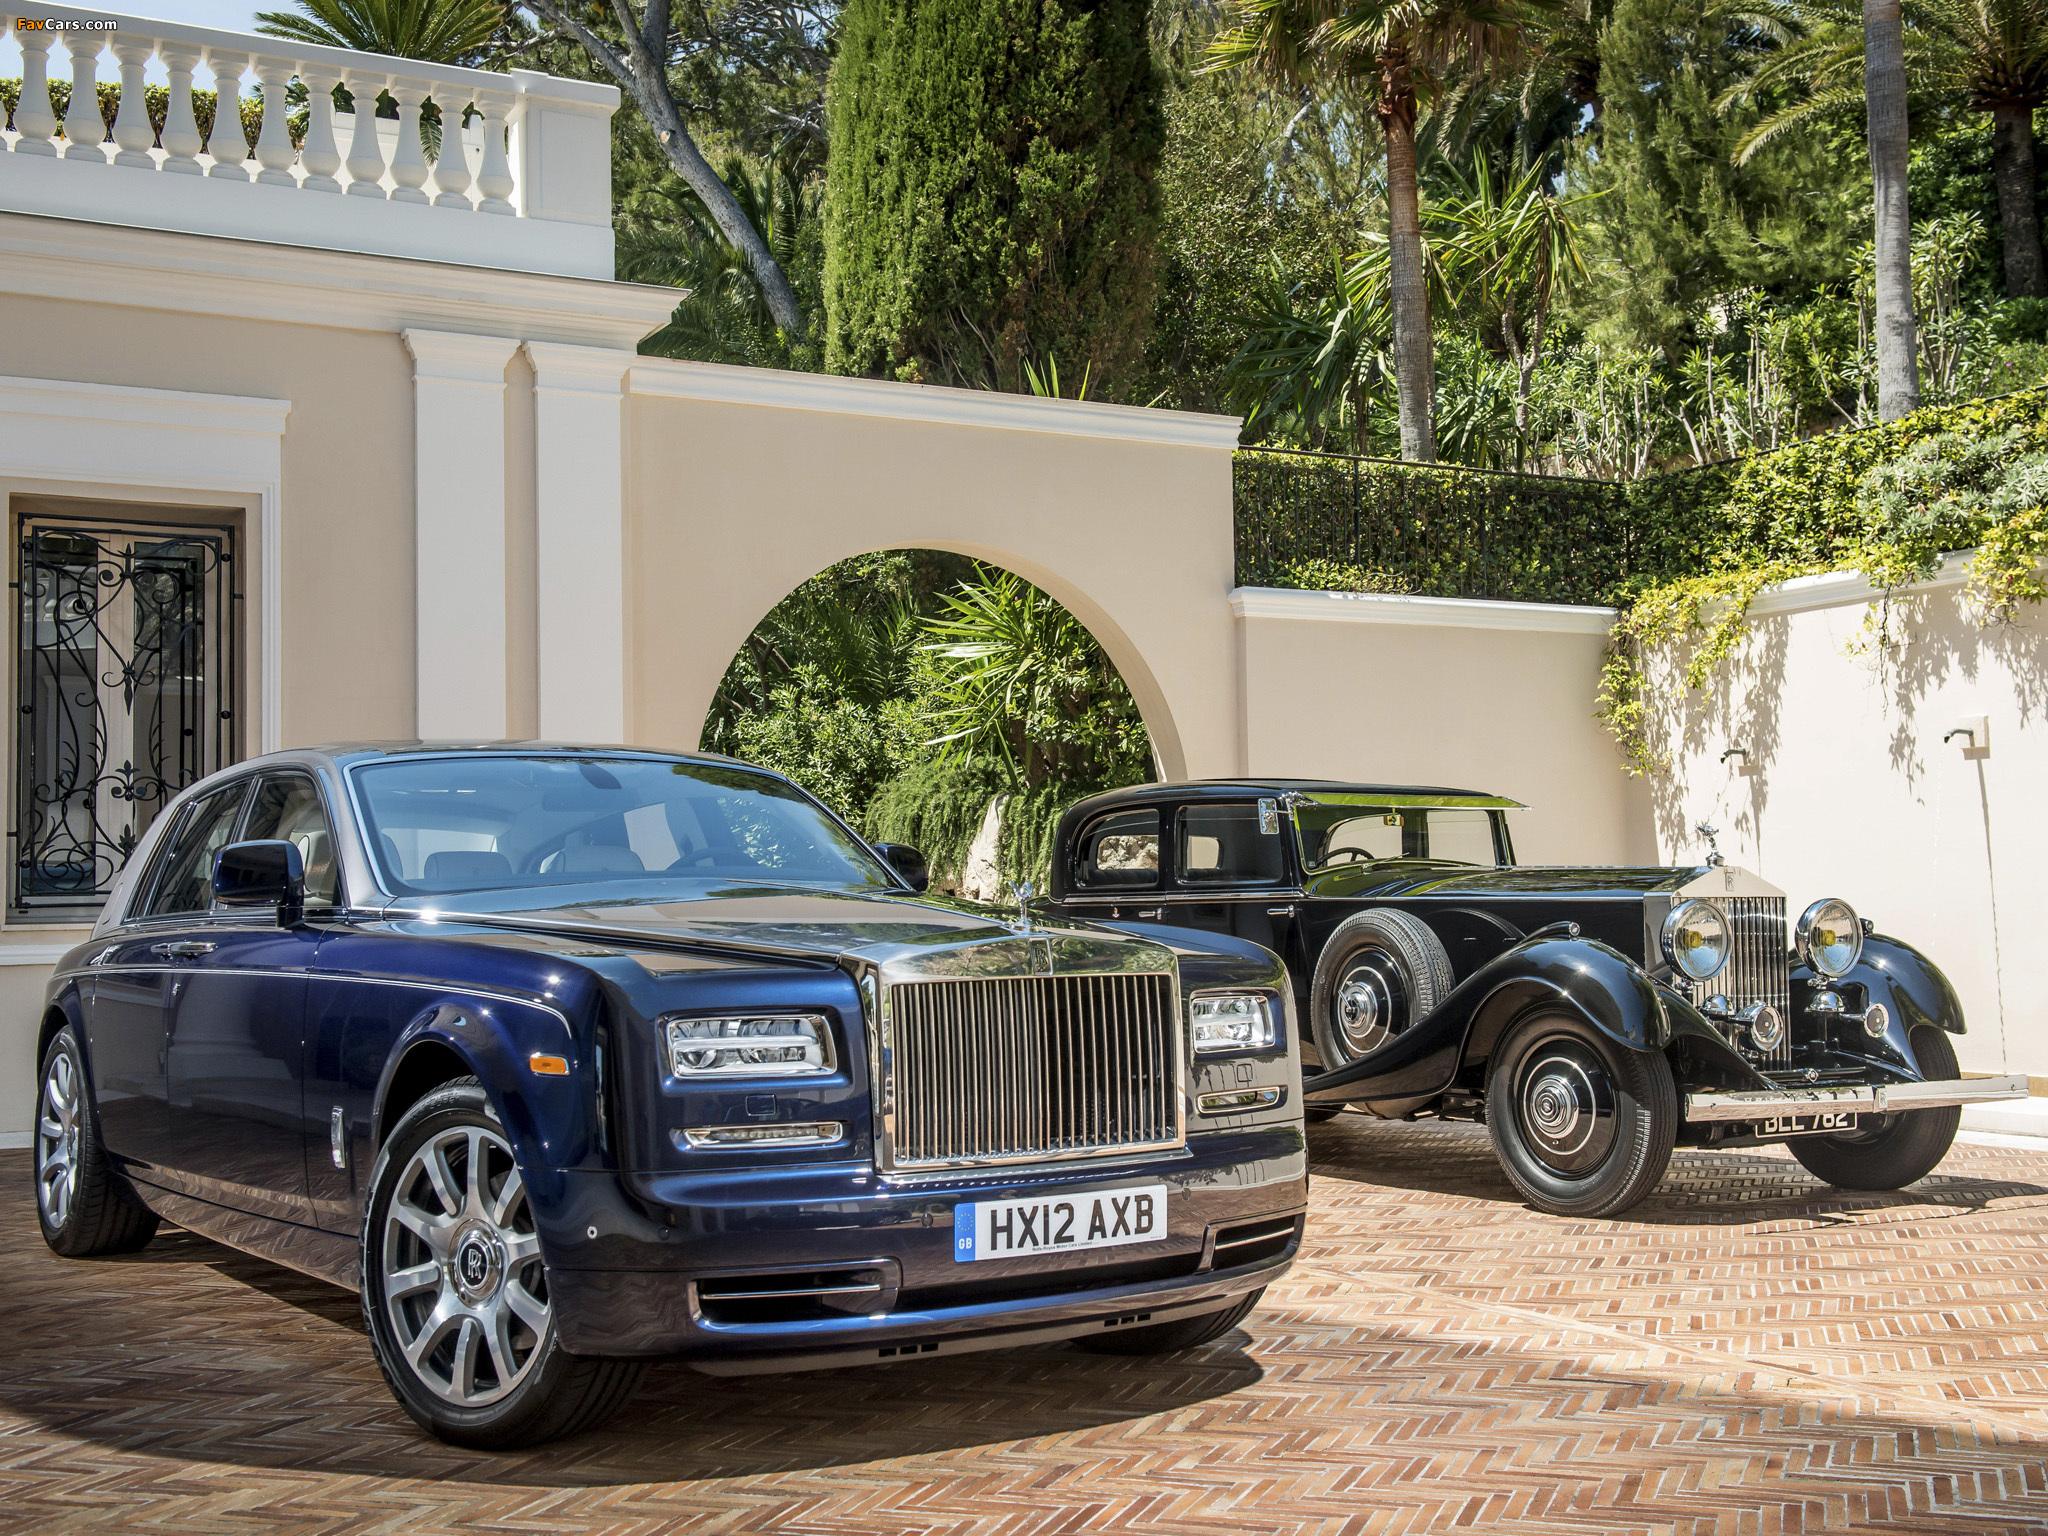 Rolls-Royce wallpapers (2048 x 1536)